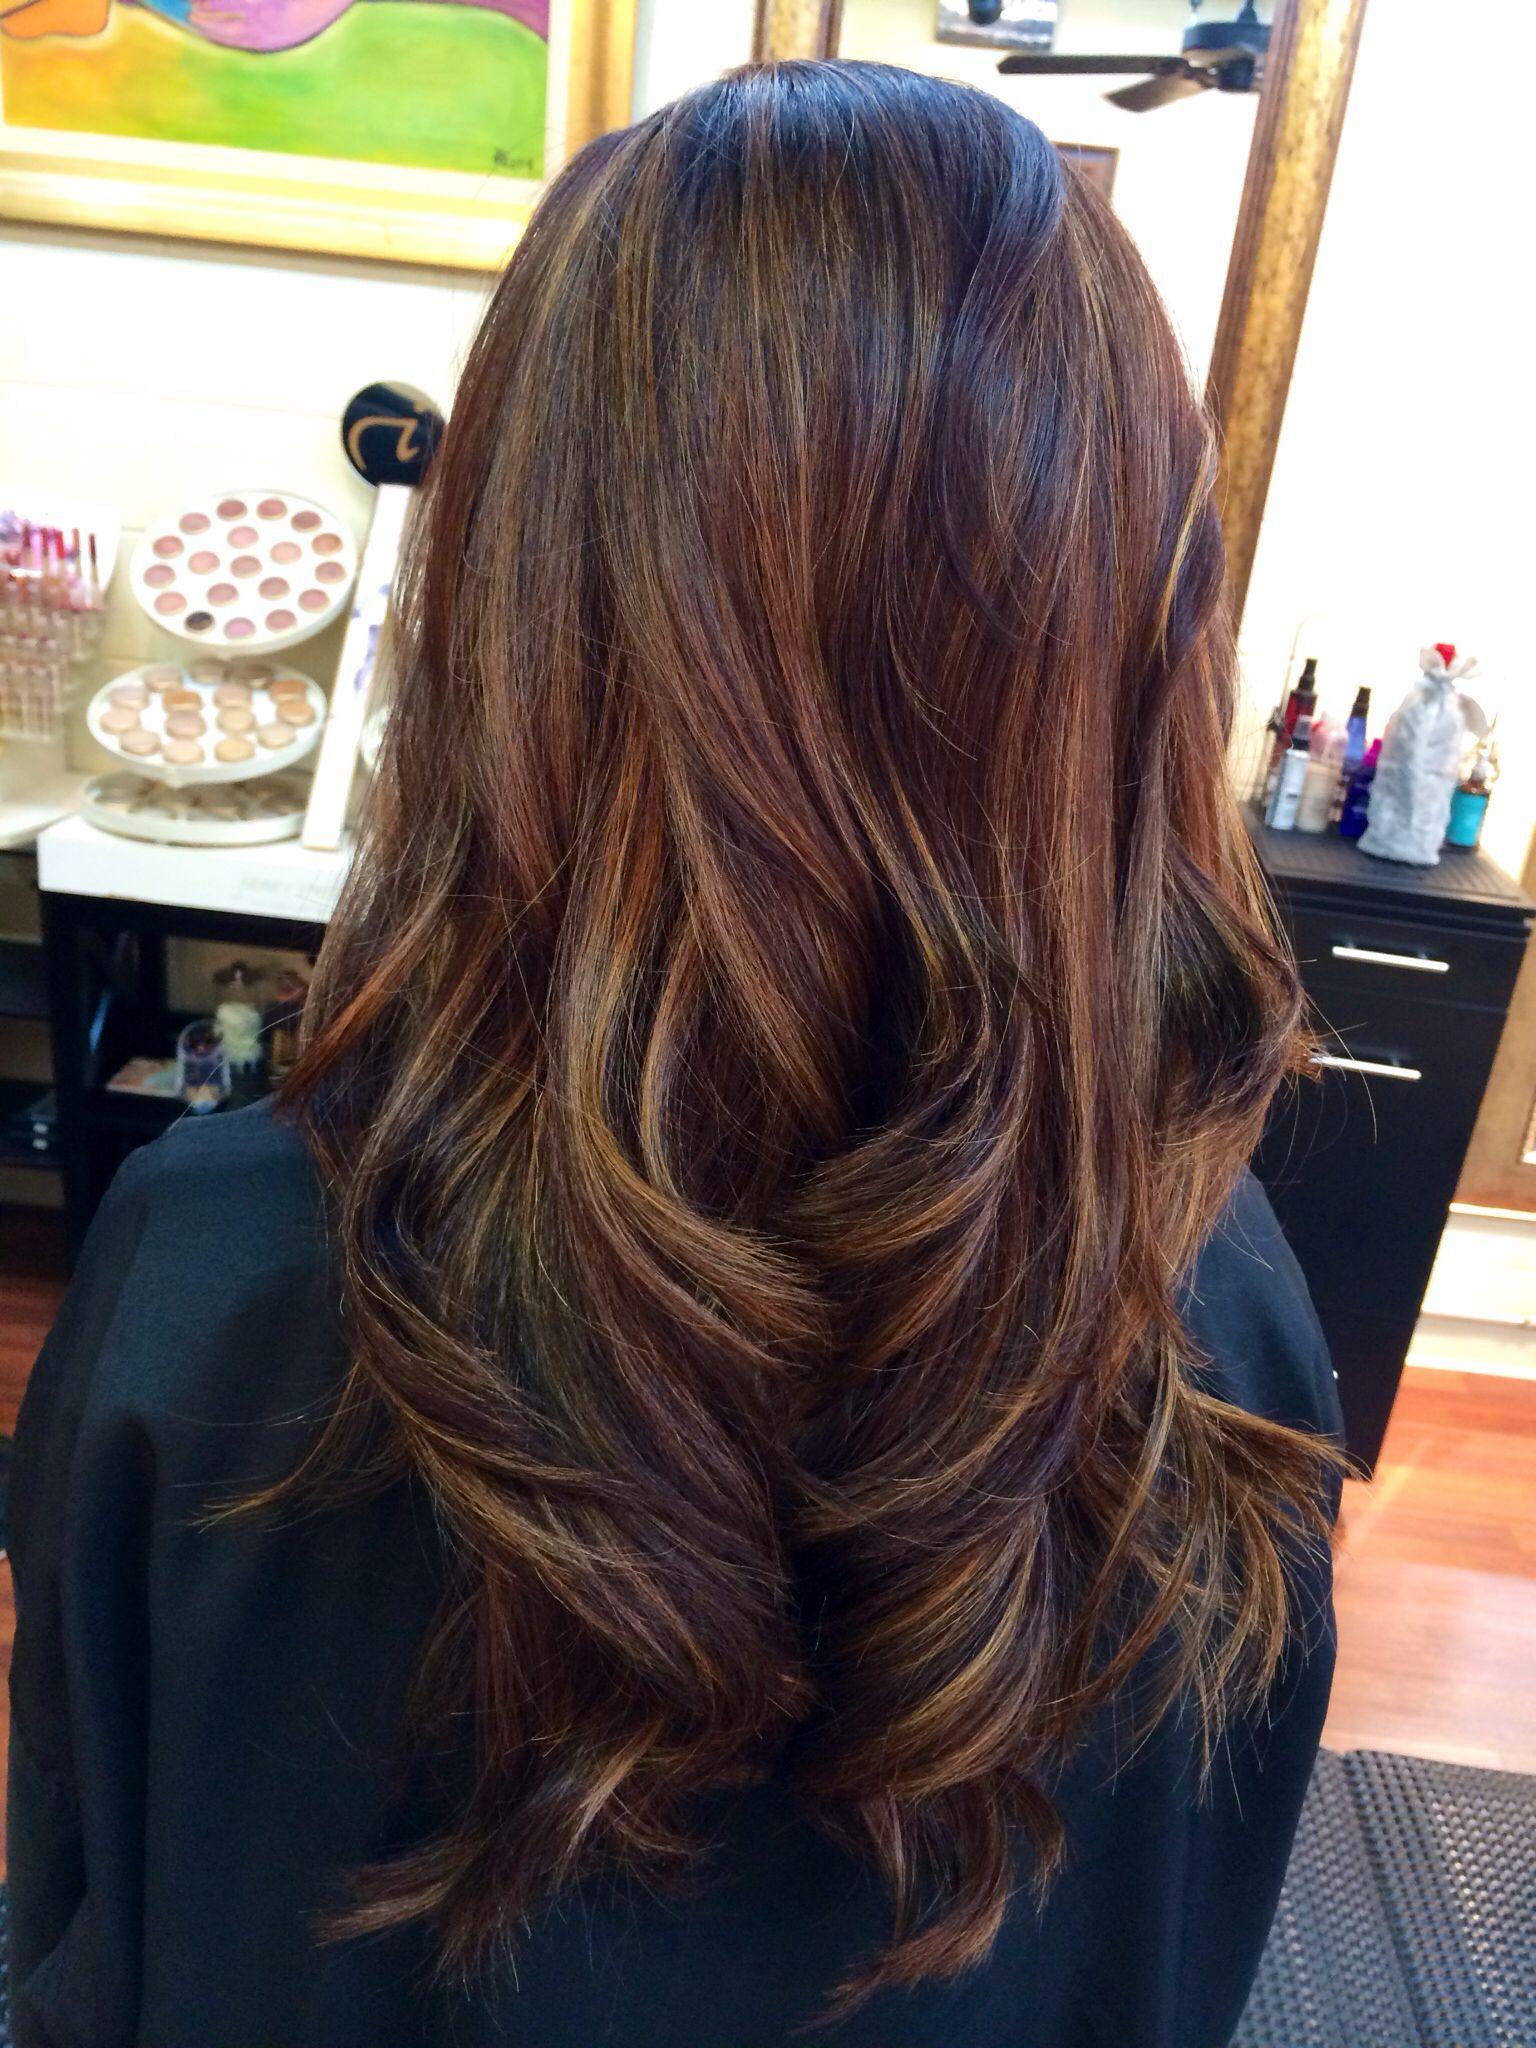 Red Brown With Golden Carmel Highlights Hair Beauty Hair Hair Highlights